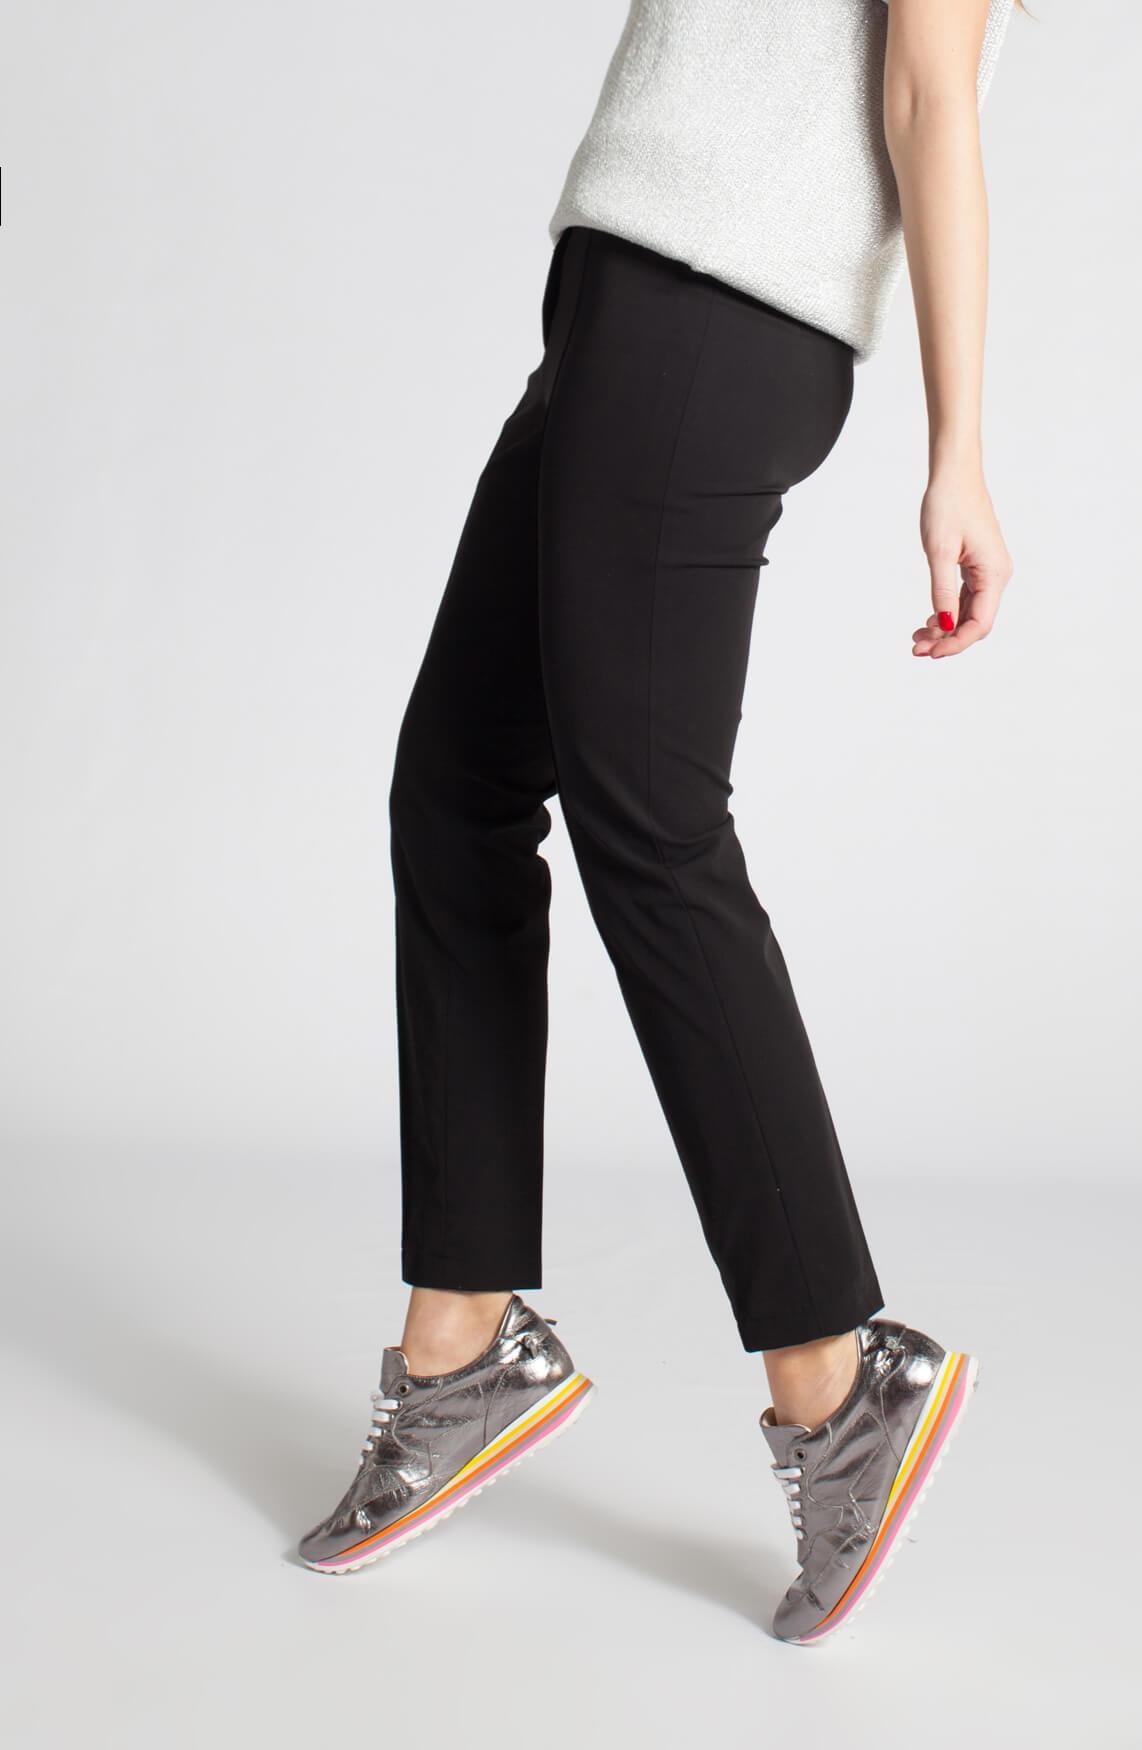 Dames Pantalon Van Anna Toor Ros Cambio xBfwSdqzx